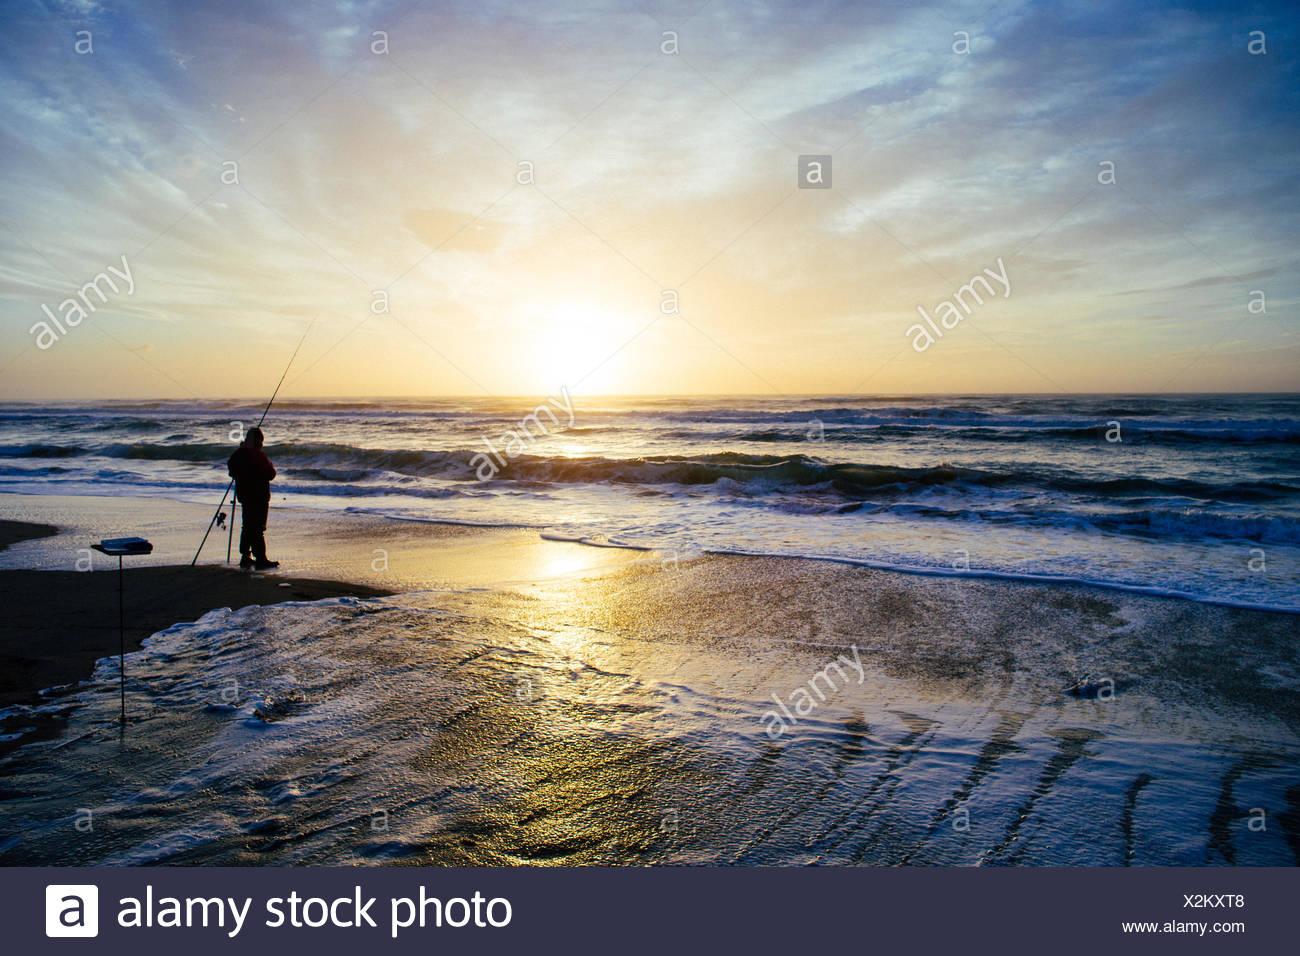 Silhouette of a Fisherman on the beach at sunset, Pescia Romana, Lazio, Italy - Stock Image